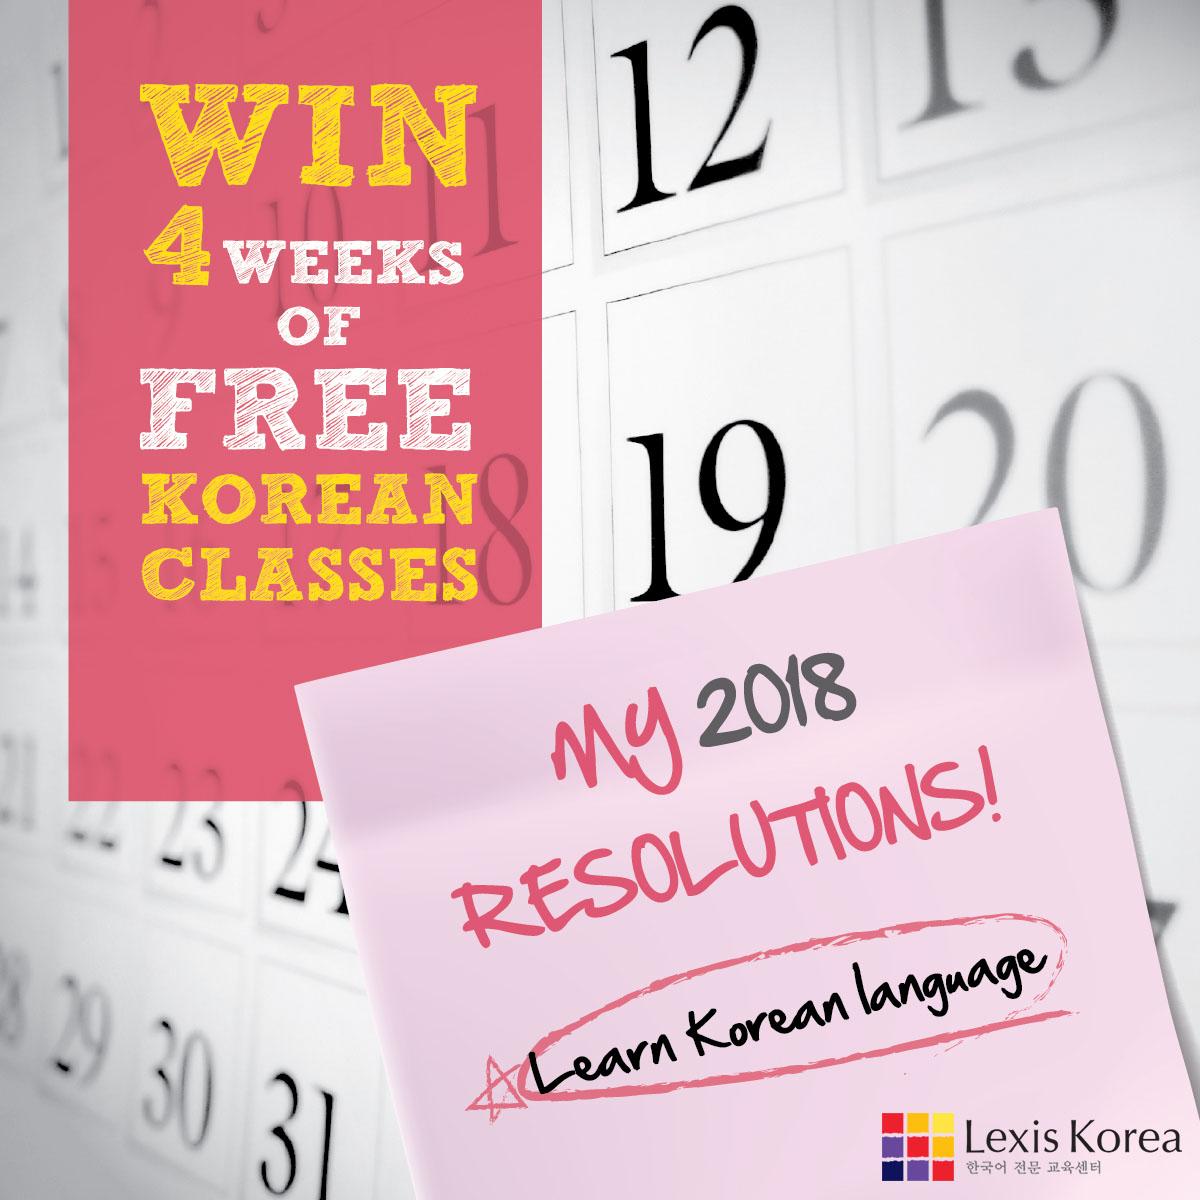 2018-resolution-pink